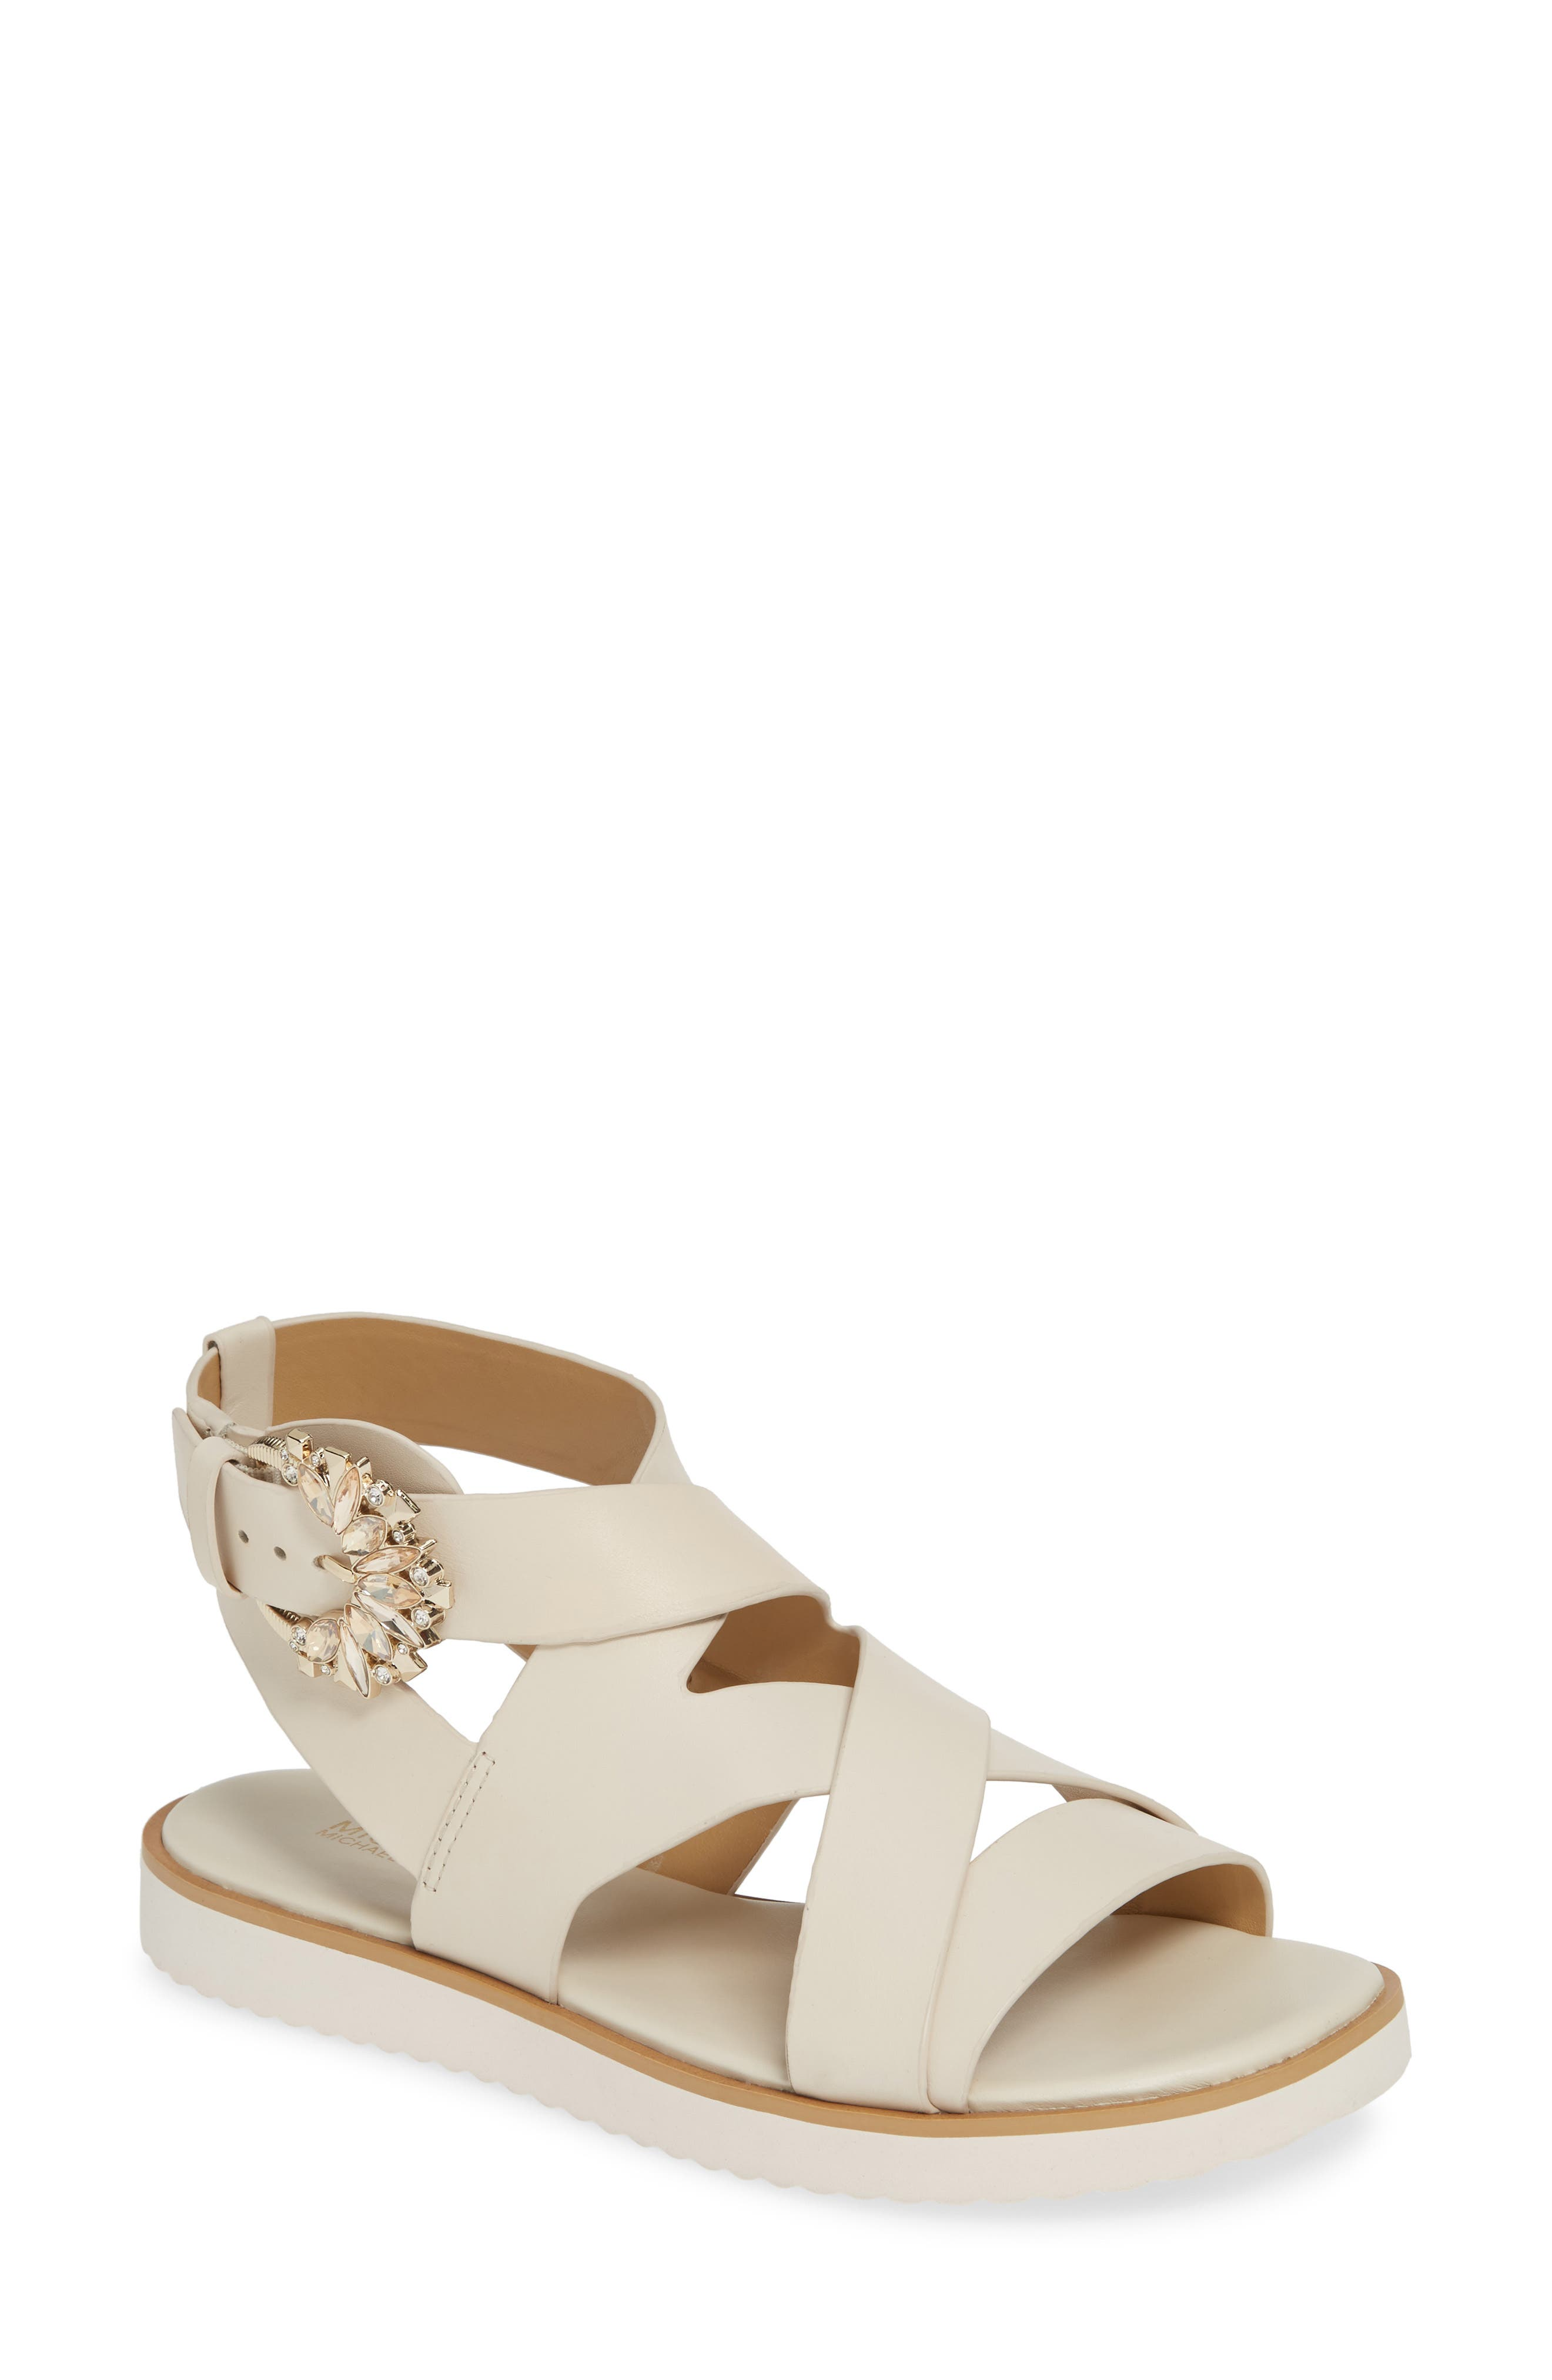 Michael Michael Kors Frieda Strappy Flat Sandal, Ivory